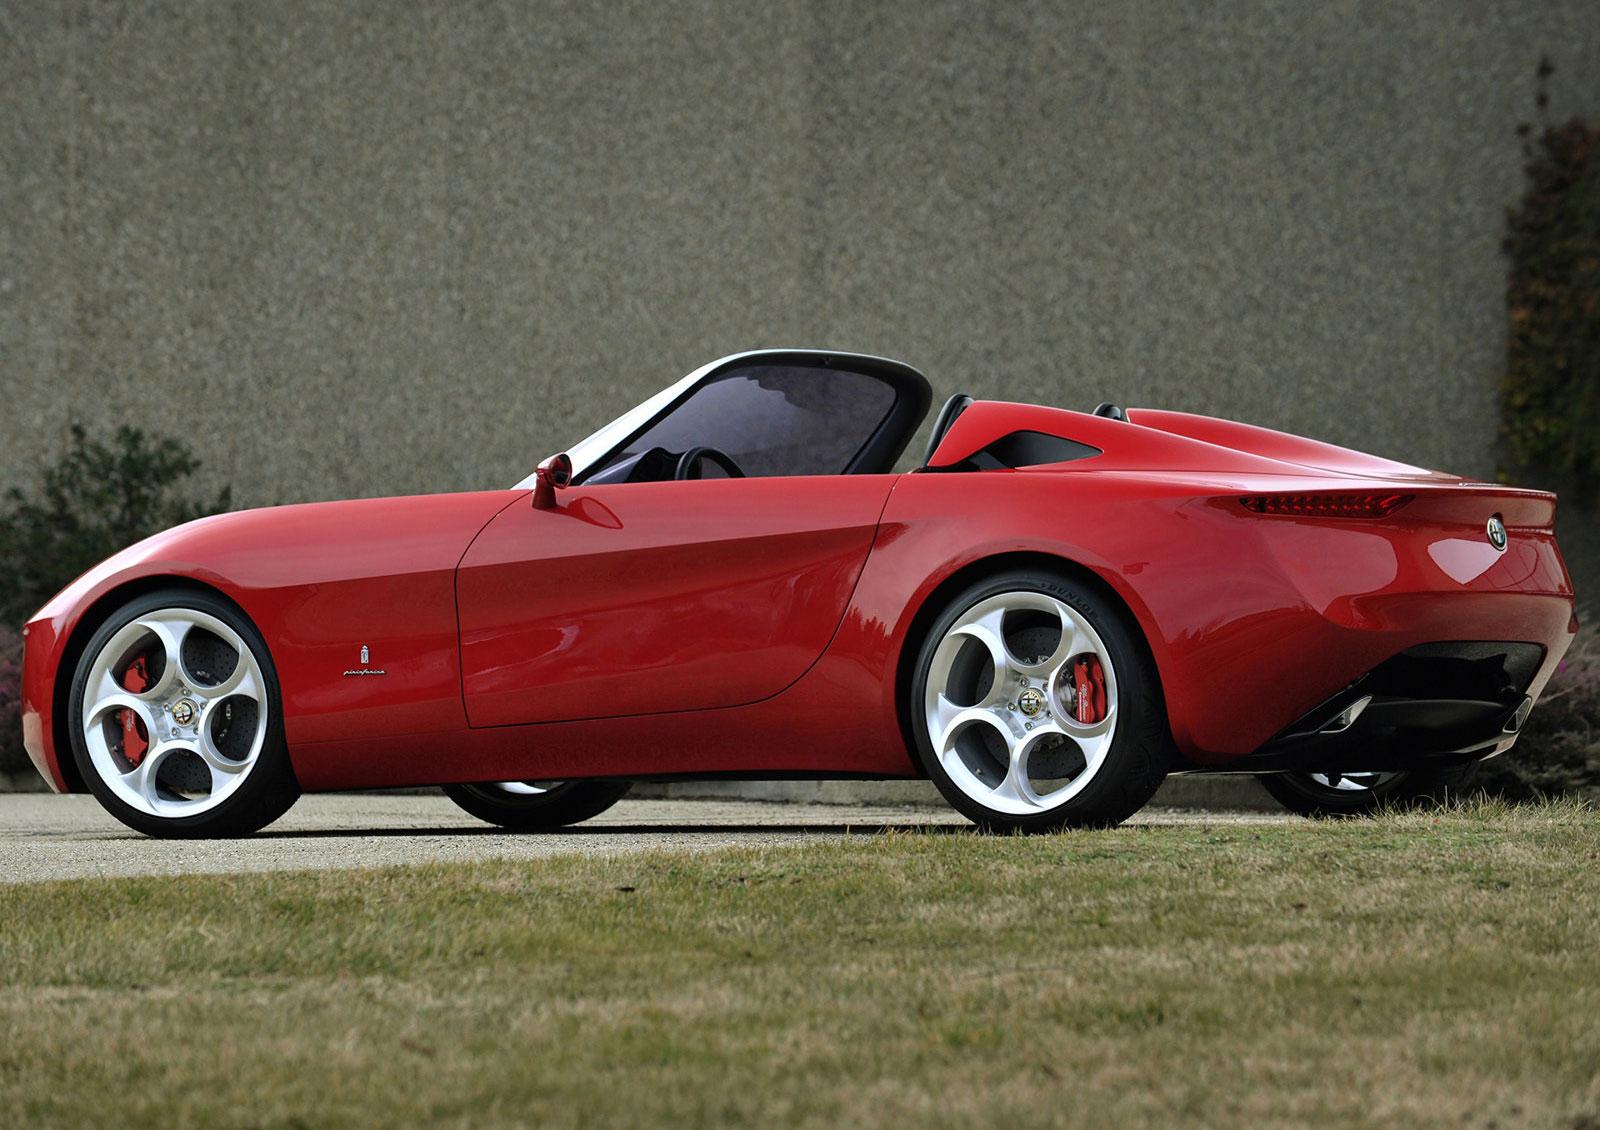 Alfa_Romeo-2uettottanta_Concept_05